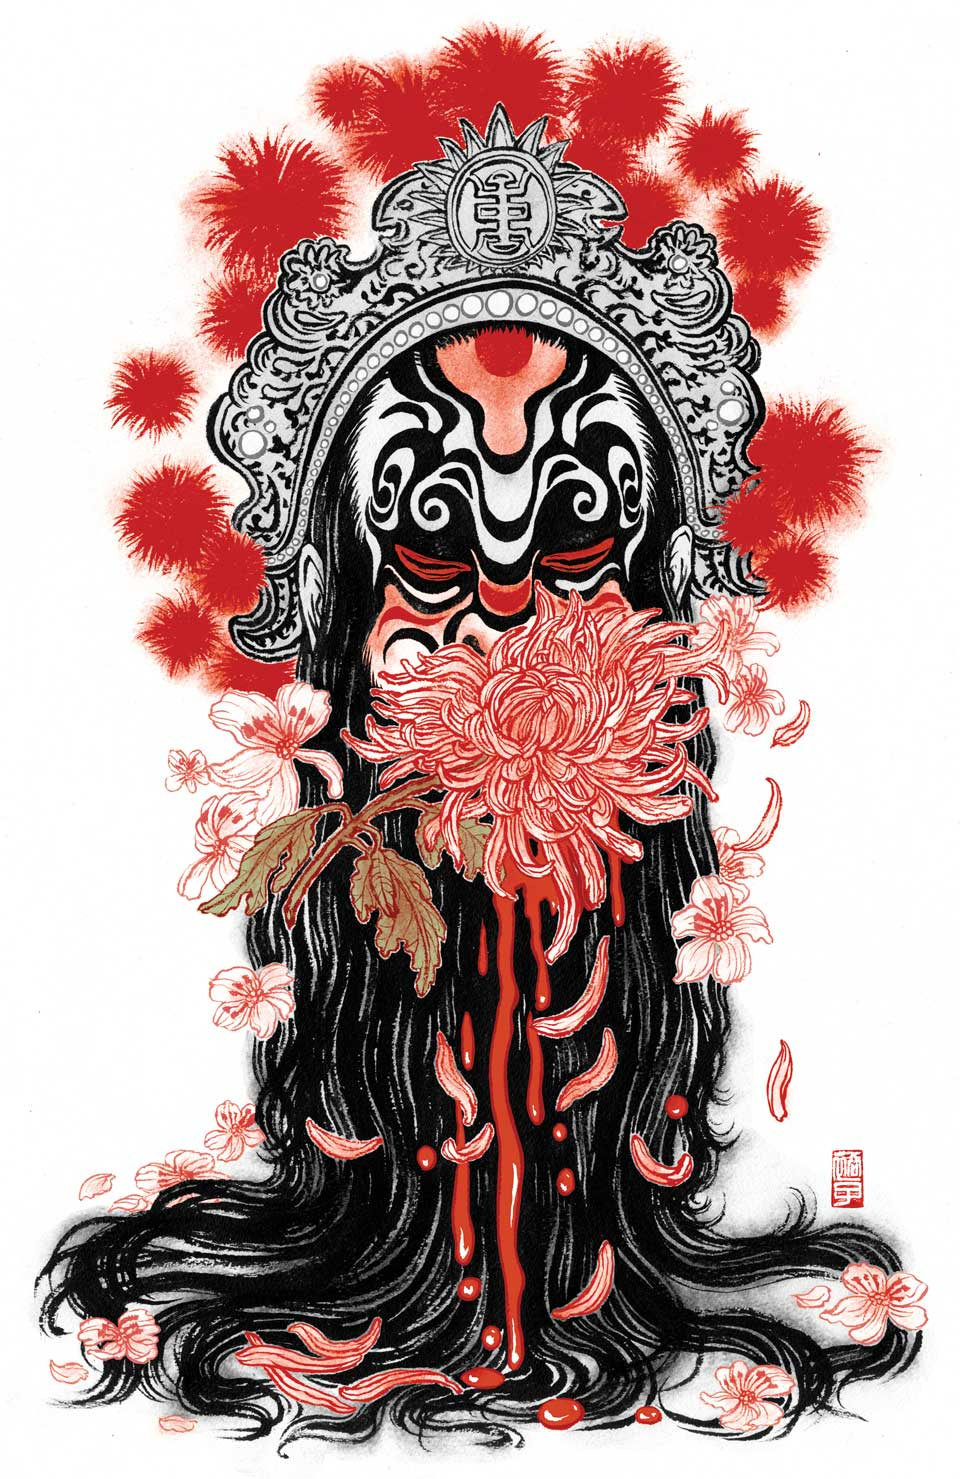 https://i2.wp.com/yukoart.com/wp-content/uploads/2013/02/sandalwood_death_mo_yan.jpg